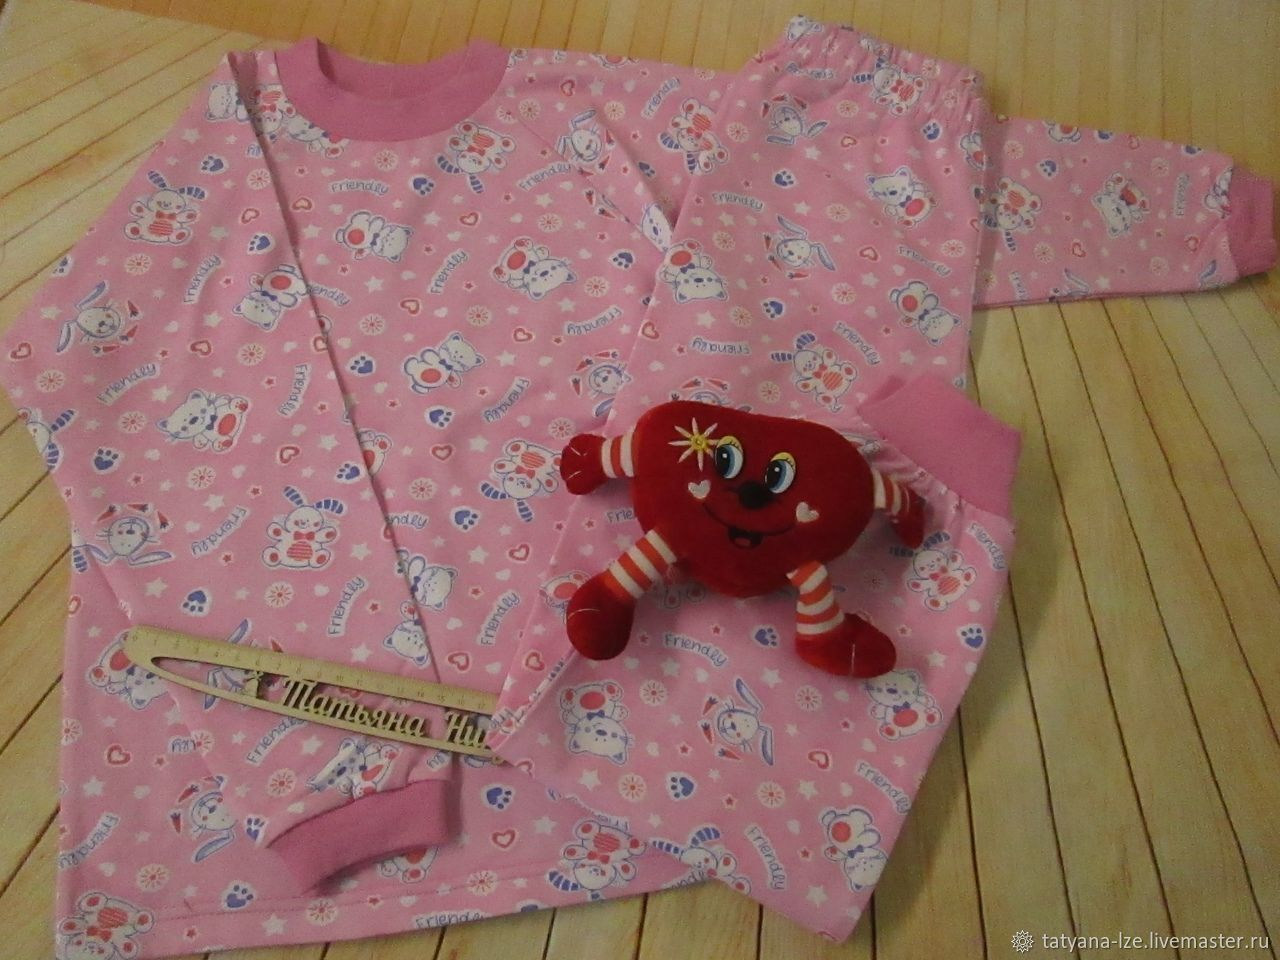 Пижама для девочки- ручная работа, Одежда, Курск, Фото №1